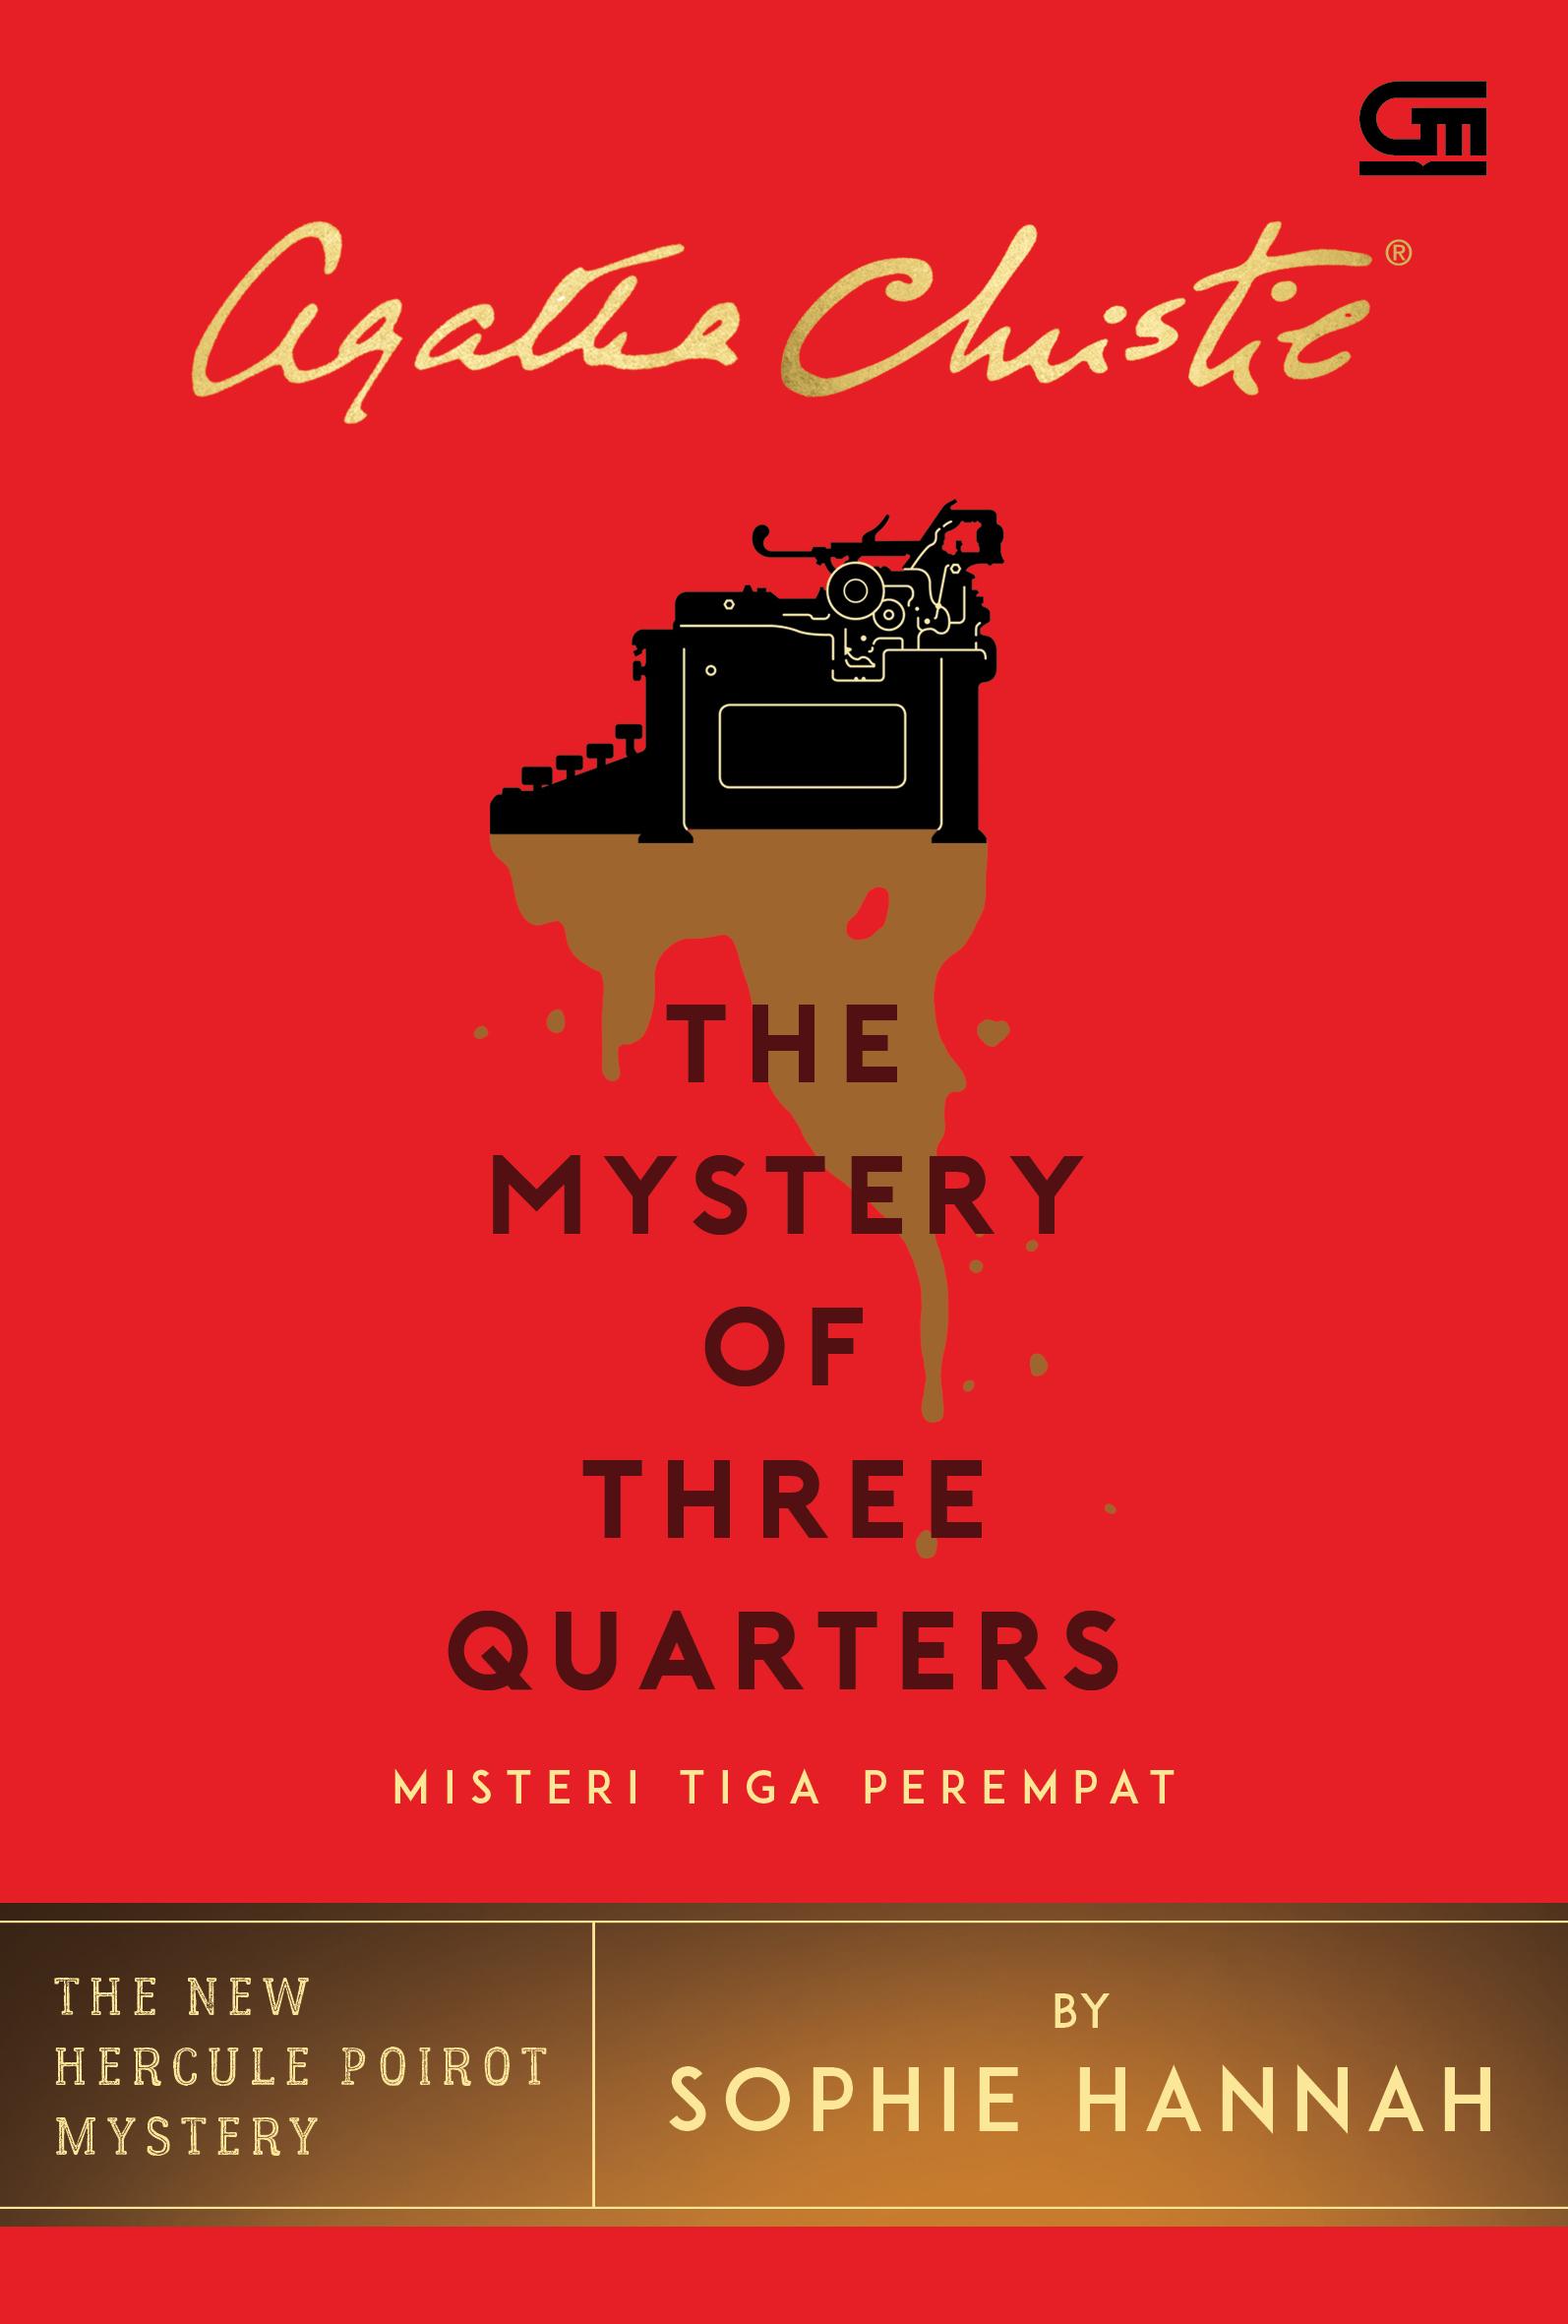 Misteri Tiga Perempat (The Mystery of Three Quarters)